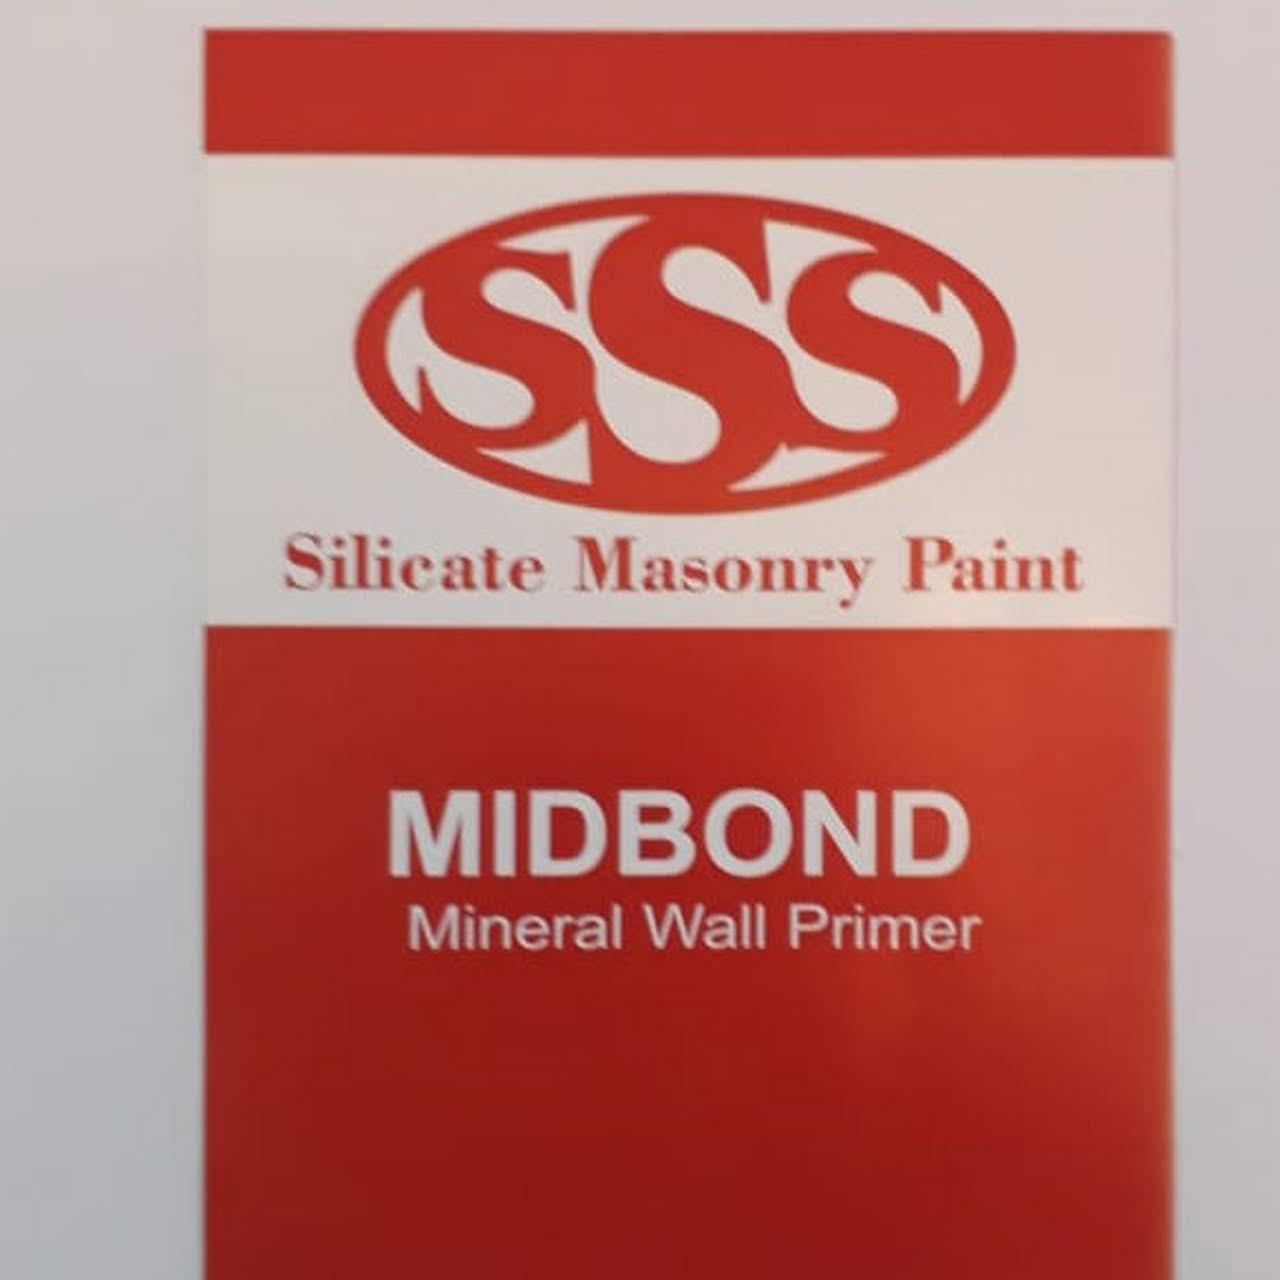 sss masonry silicate paint - Painting in Chennai